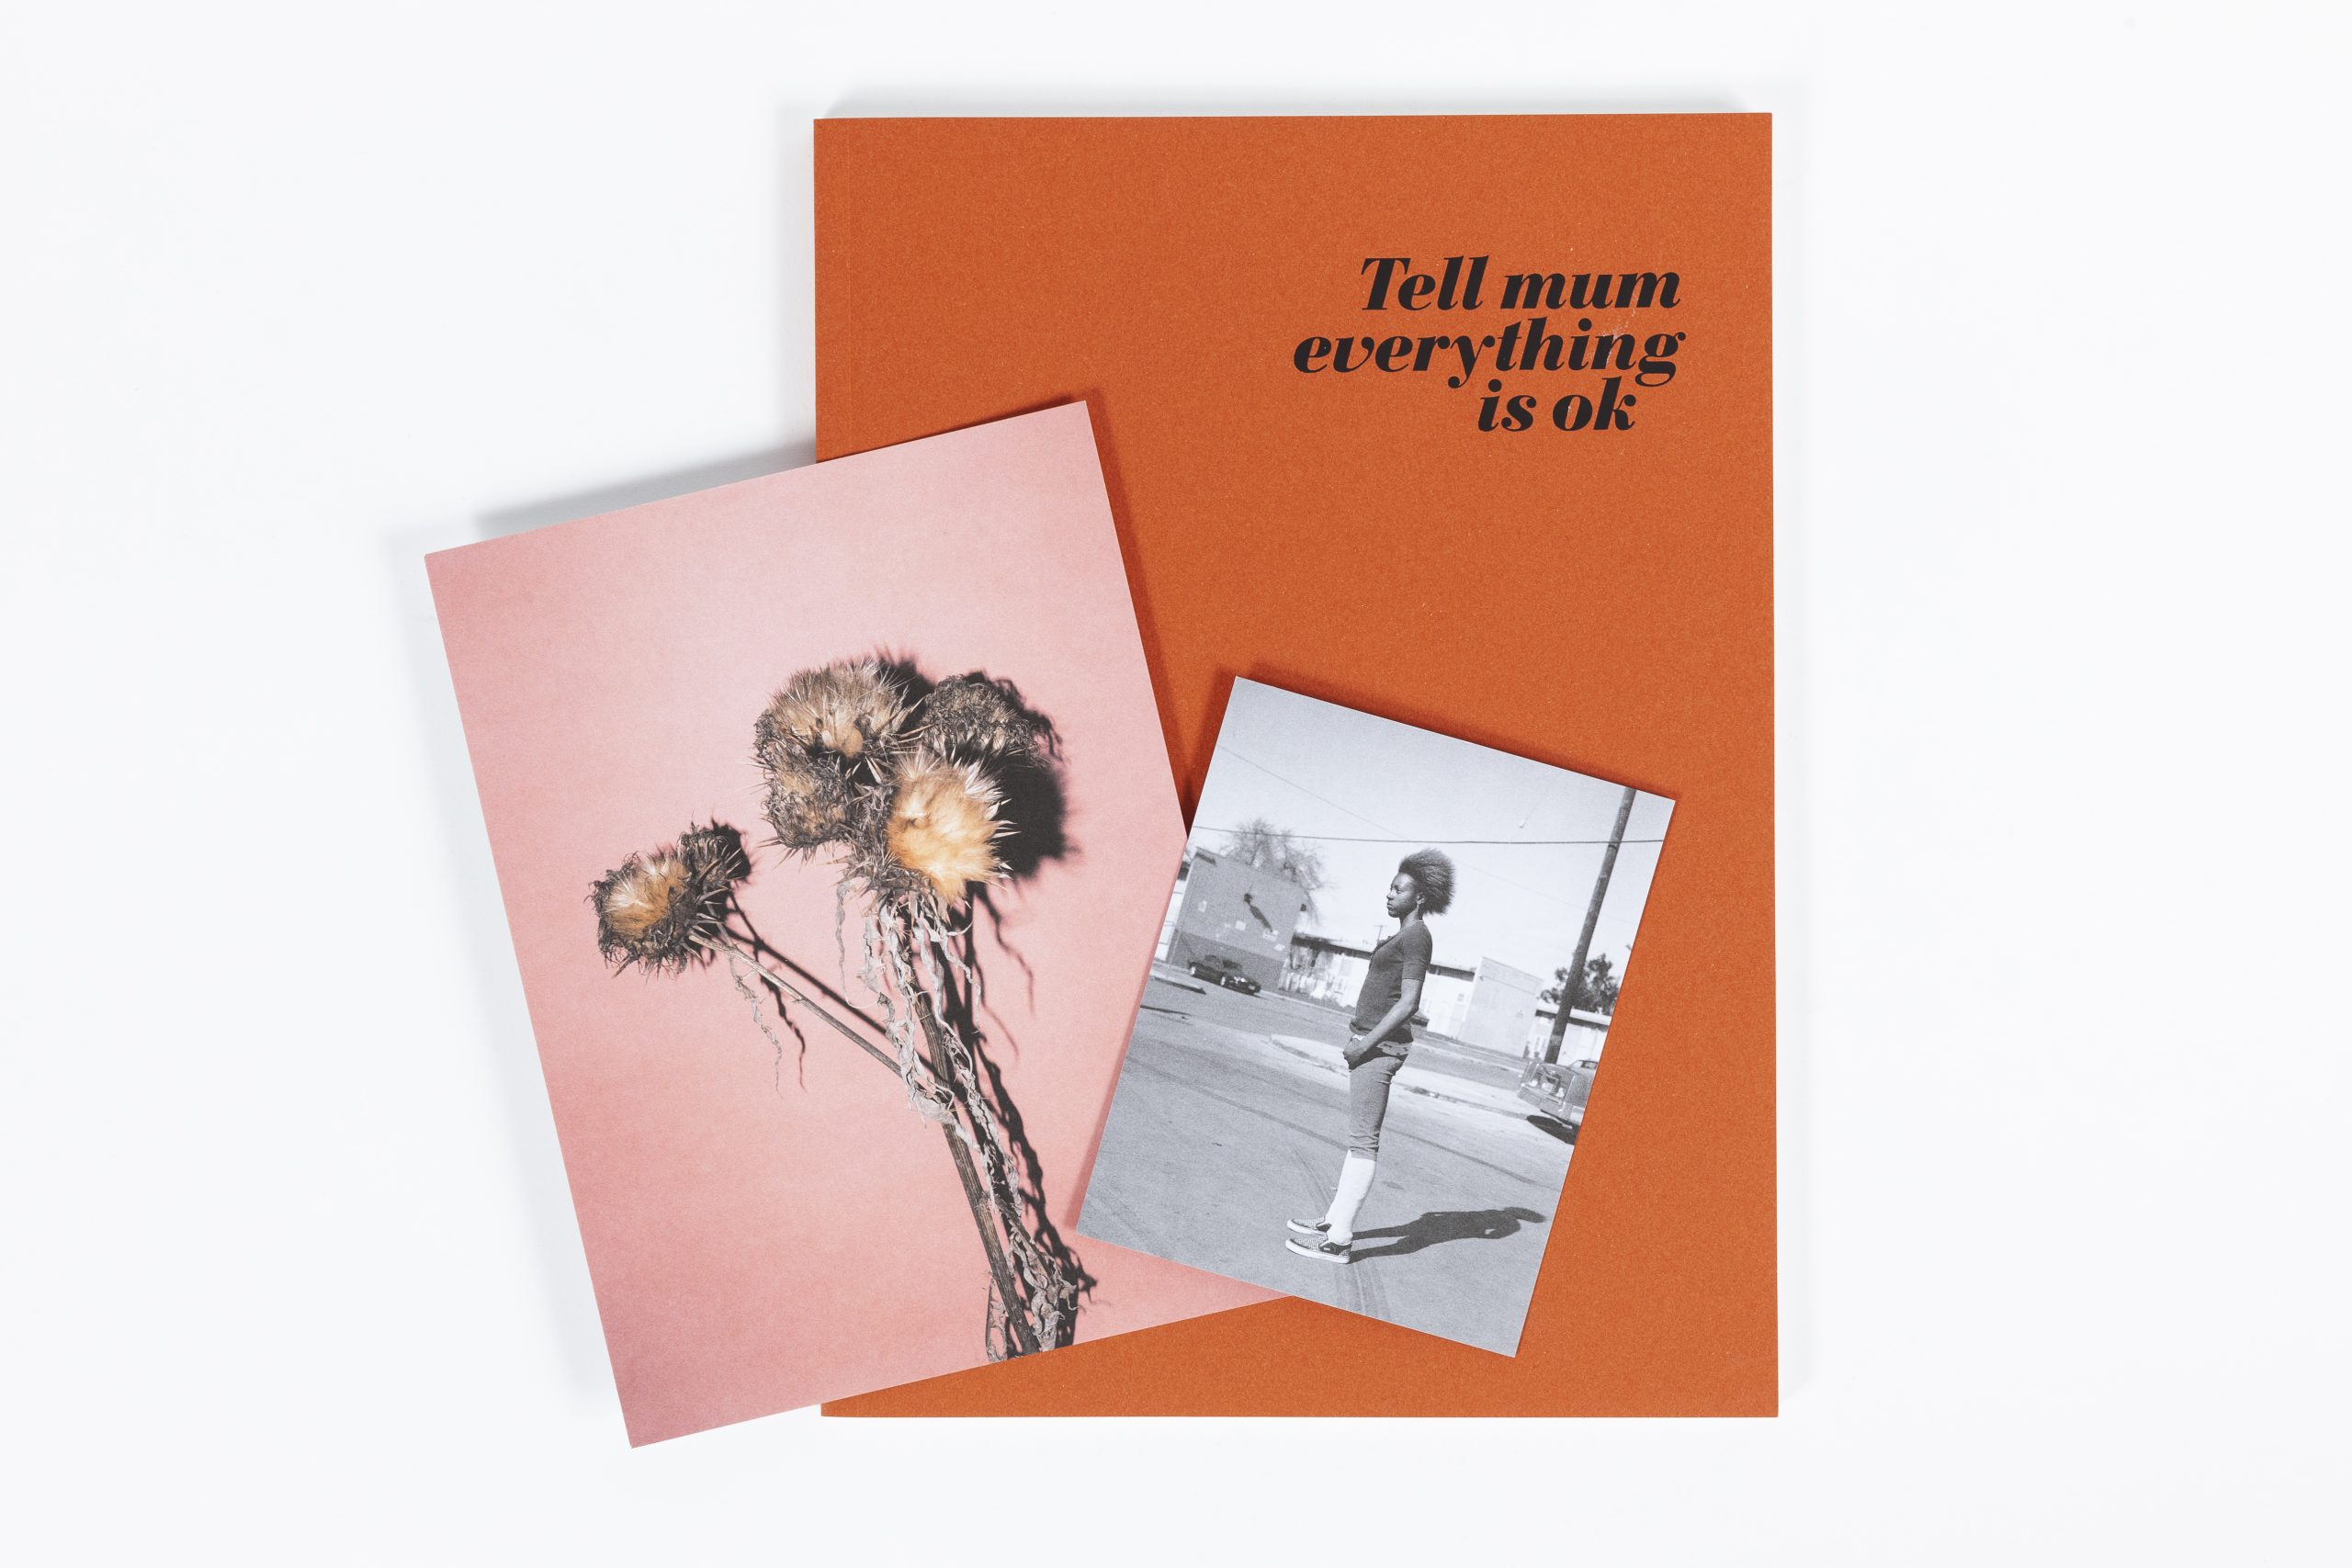 Tell mum everything is ok #6